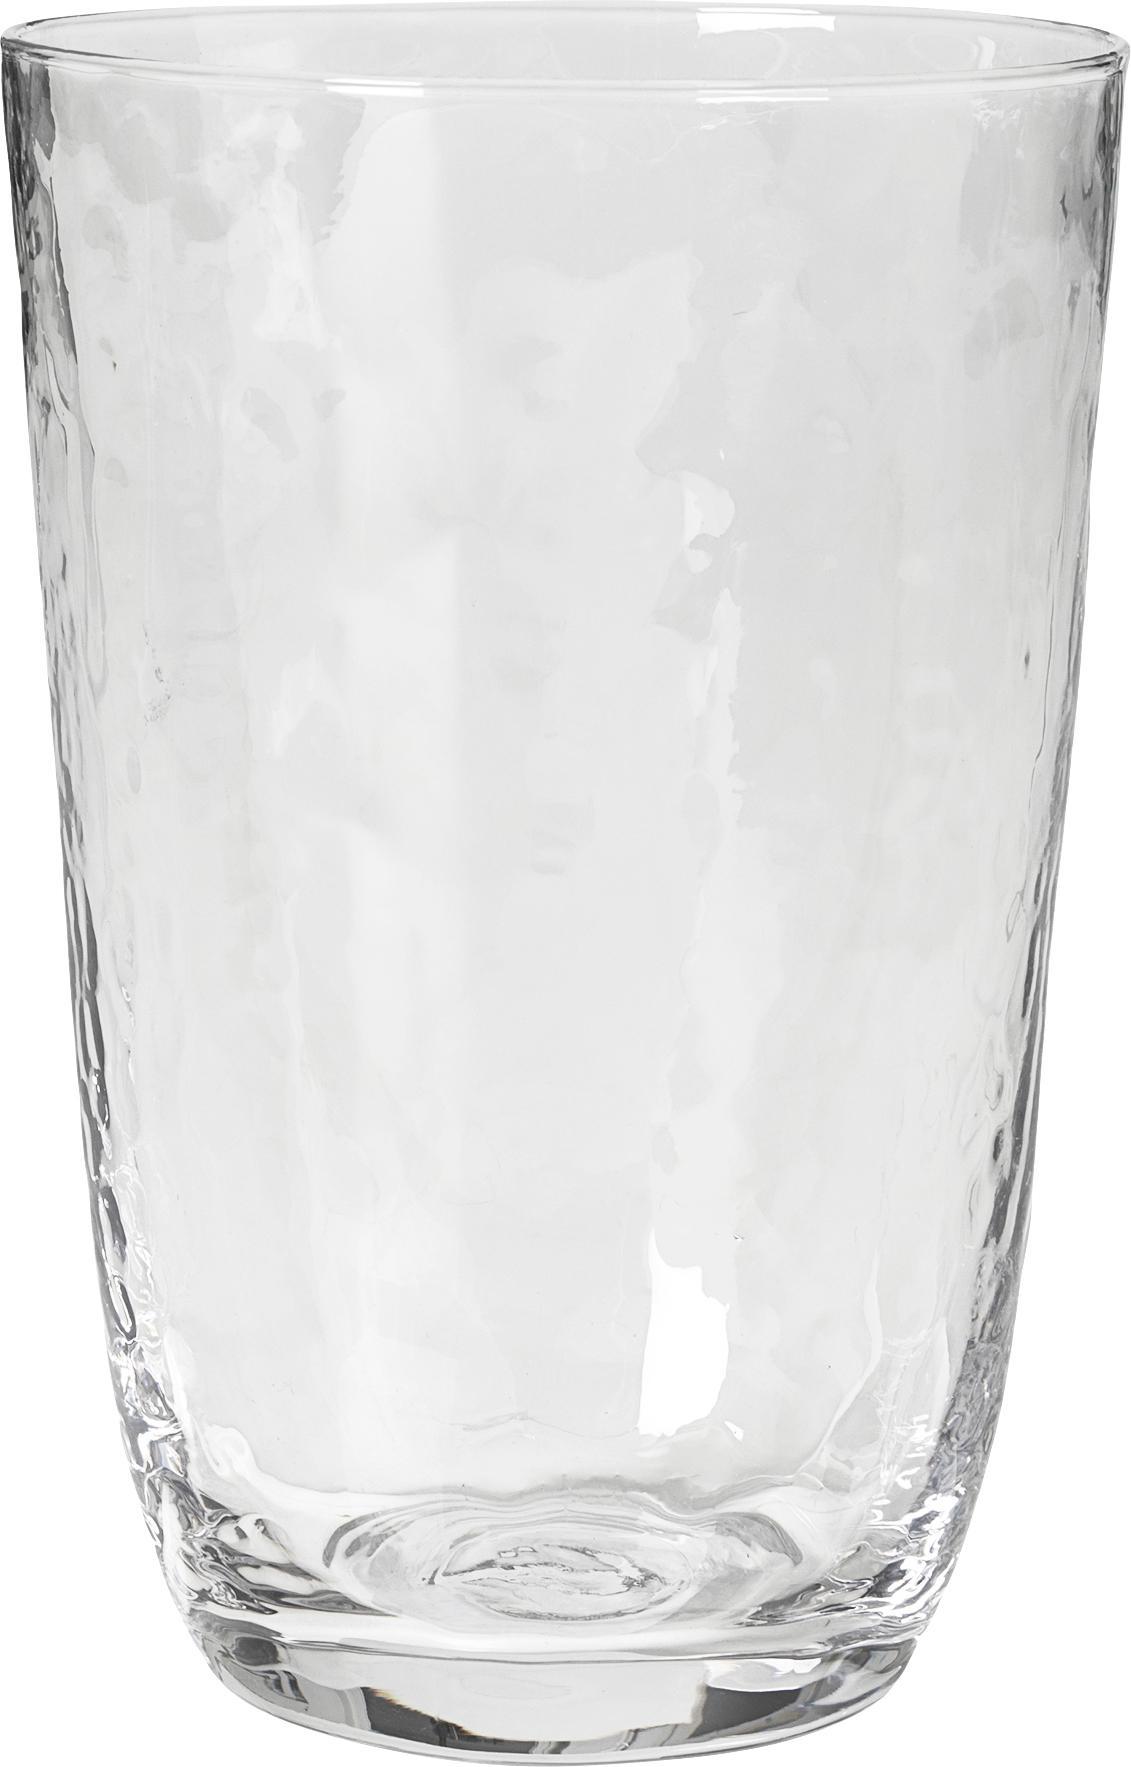 Vasos de vidrio soplado Hammered, 4uds., Vidrio soplado, Transparente, Ø 9 x Al 14 cm